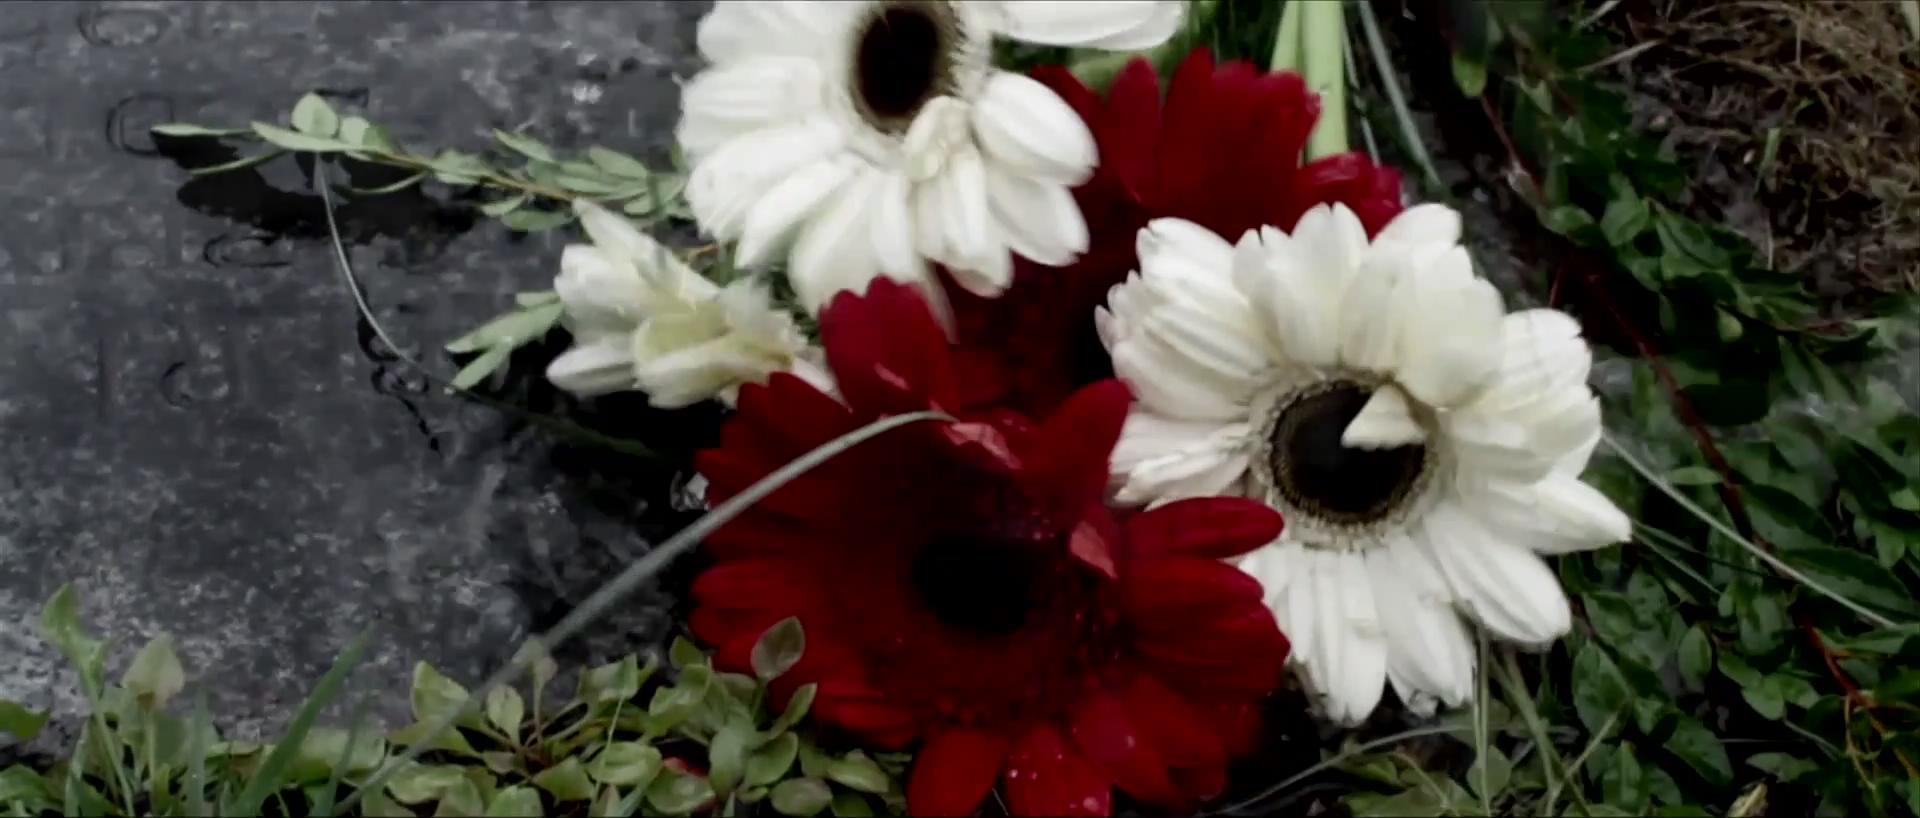 rfmt-109-flowers